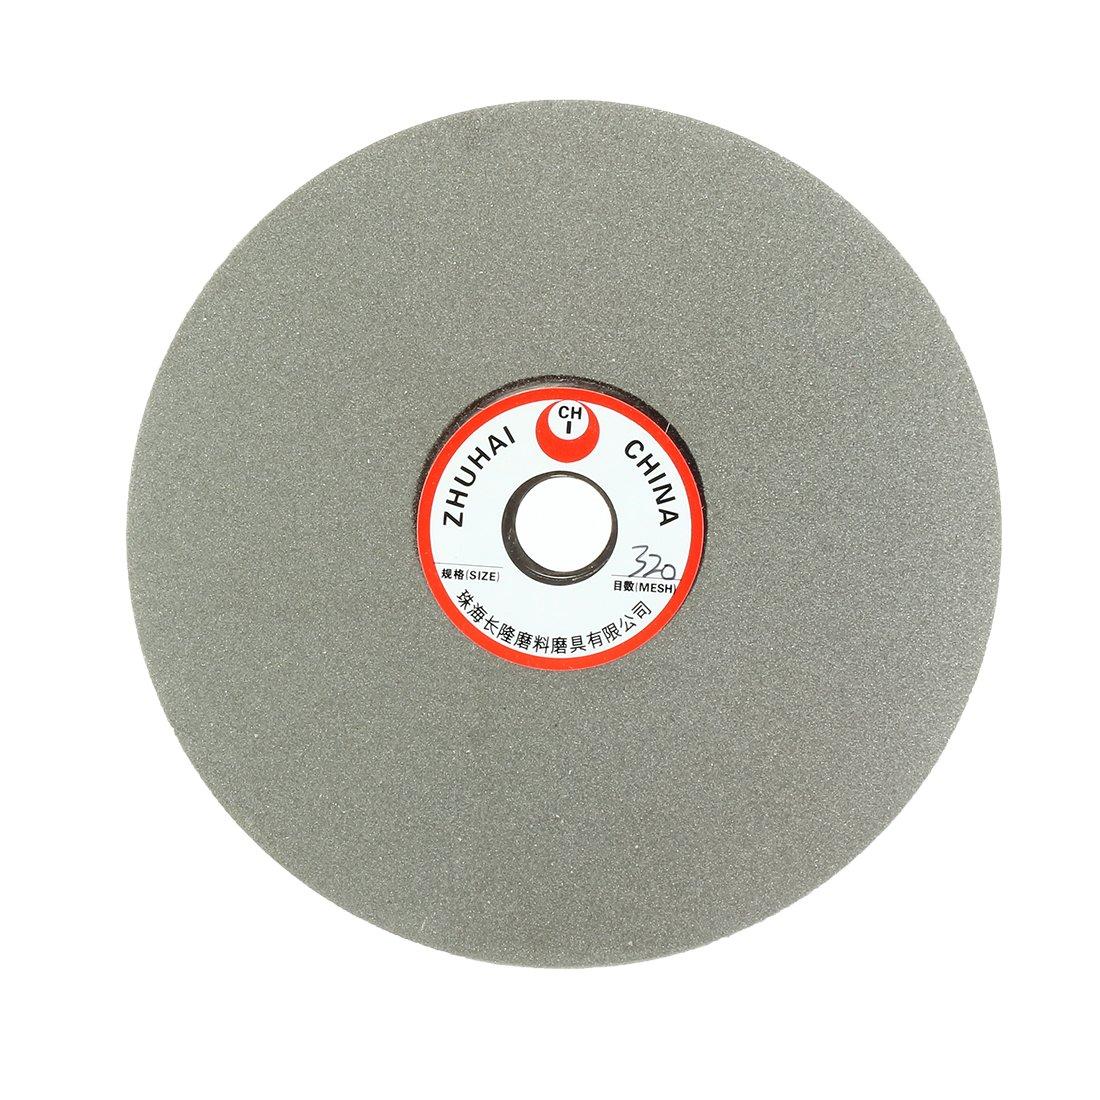 uxcell 6-inch Grit 320 Diamond Coated Flat Lap Wheel Grinding Disc Polishing Tool